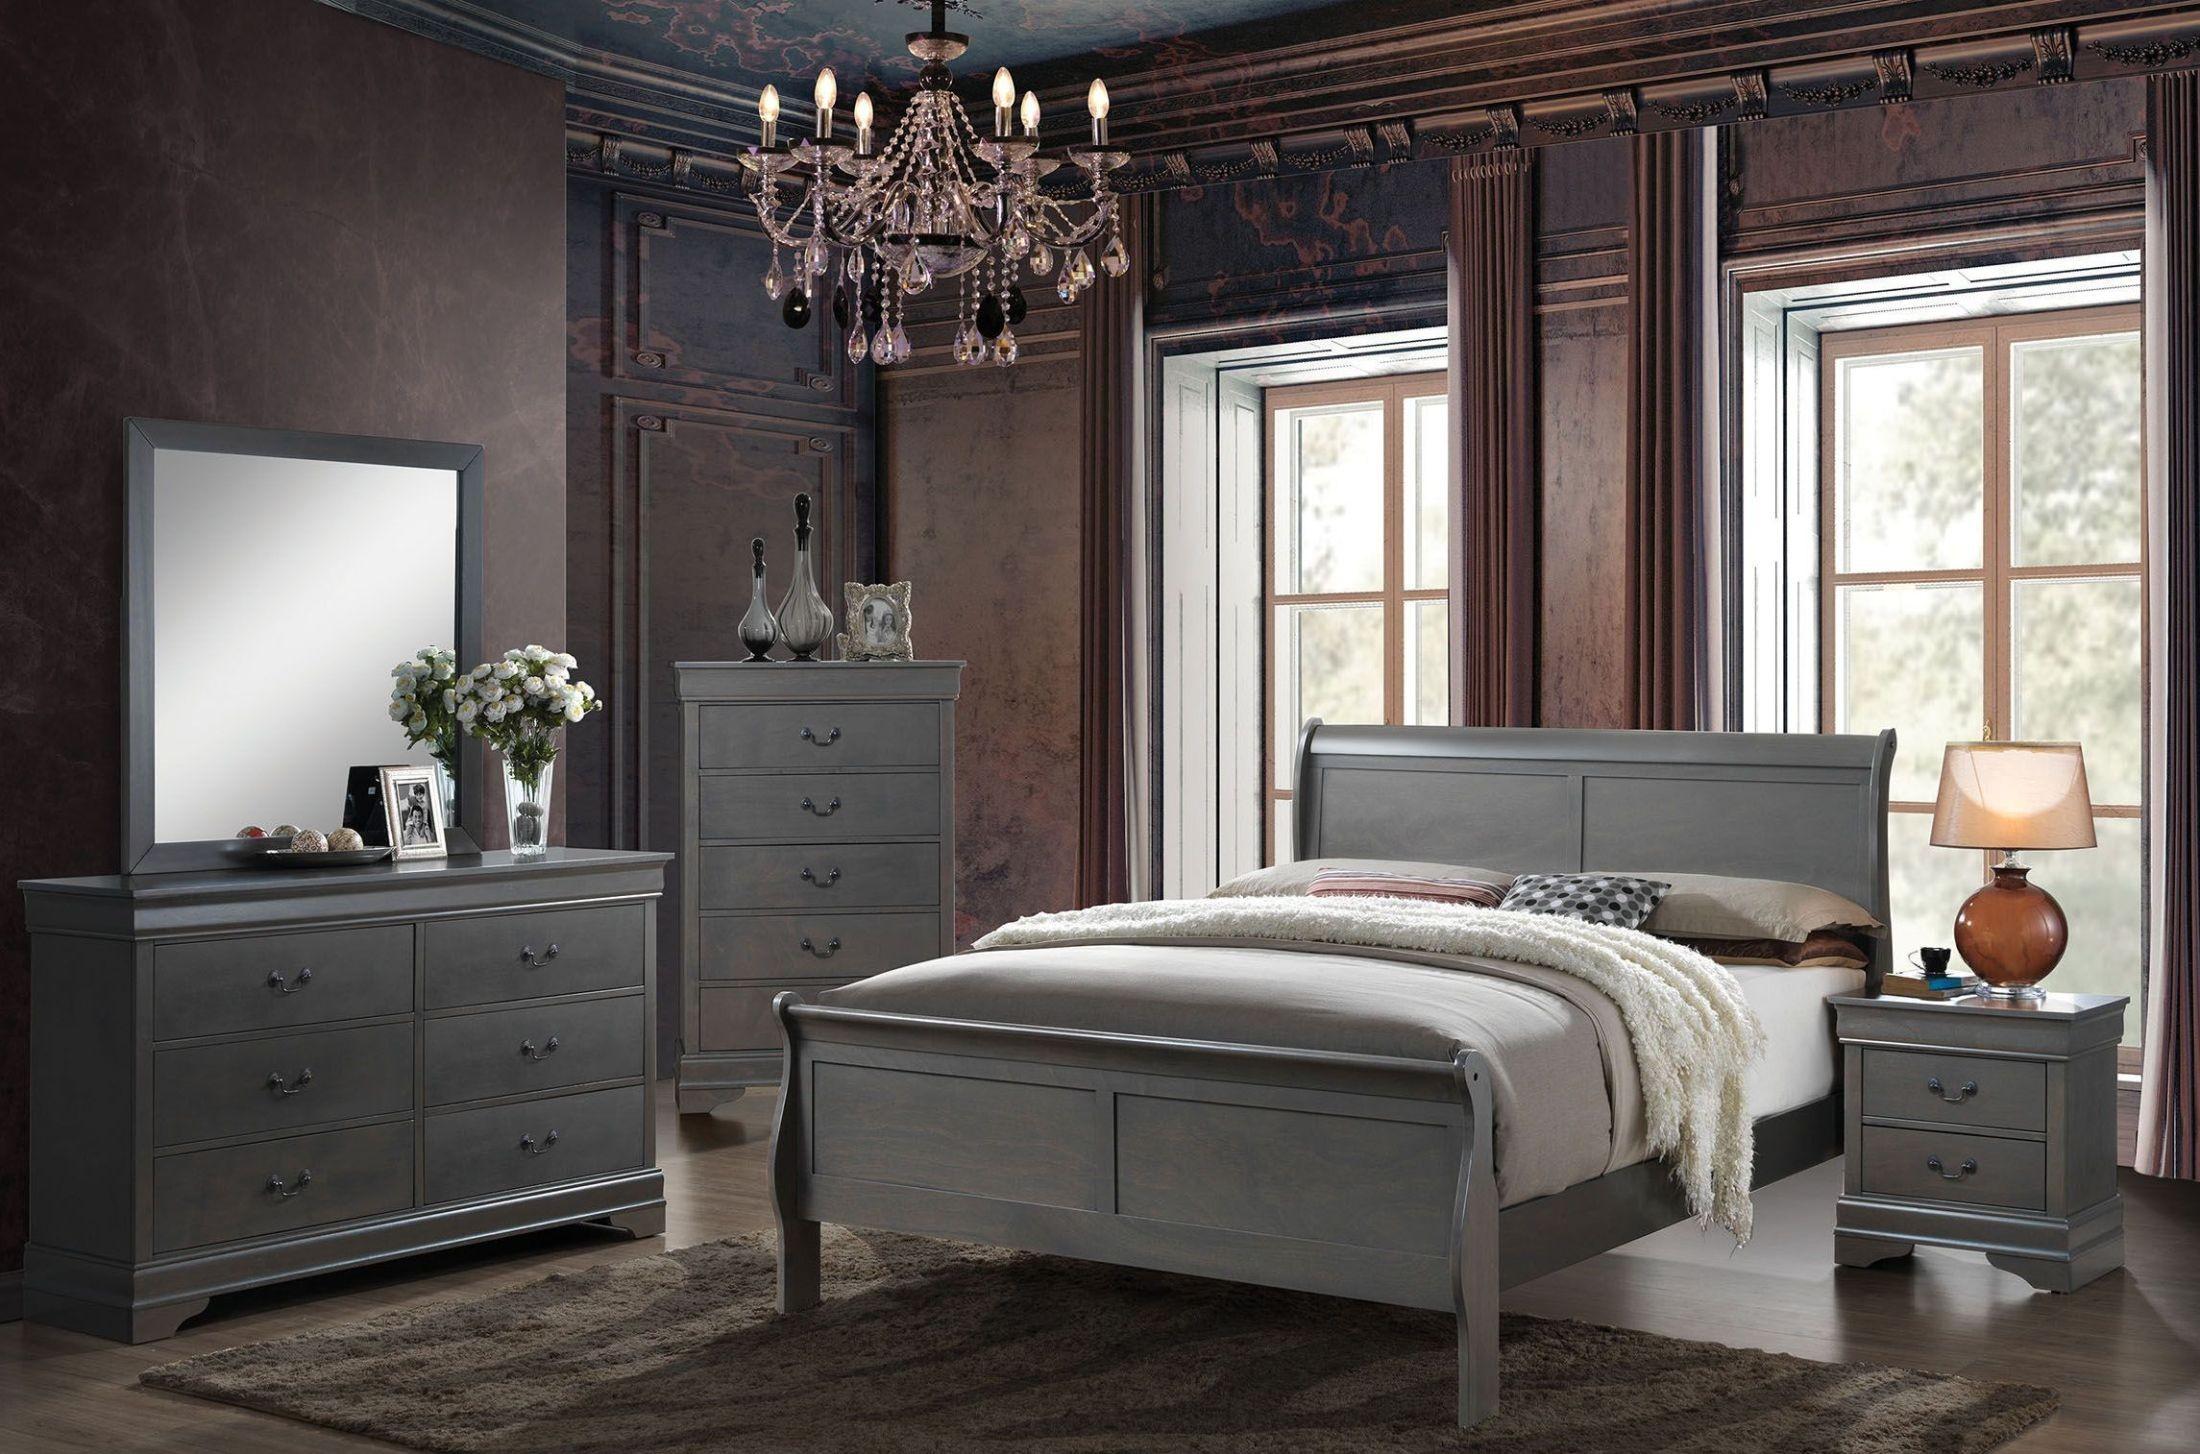 Louis philippe iii gray youth sleigh bedroom set from - Louis philippe bedroom collection ...